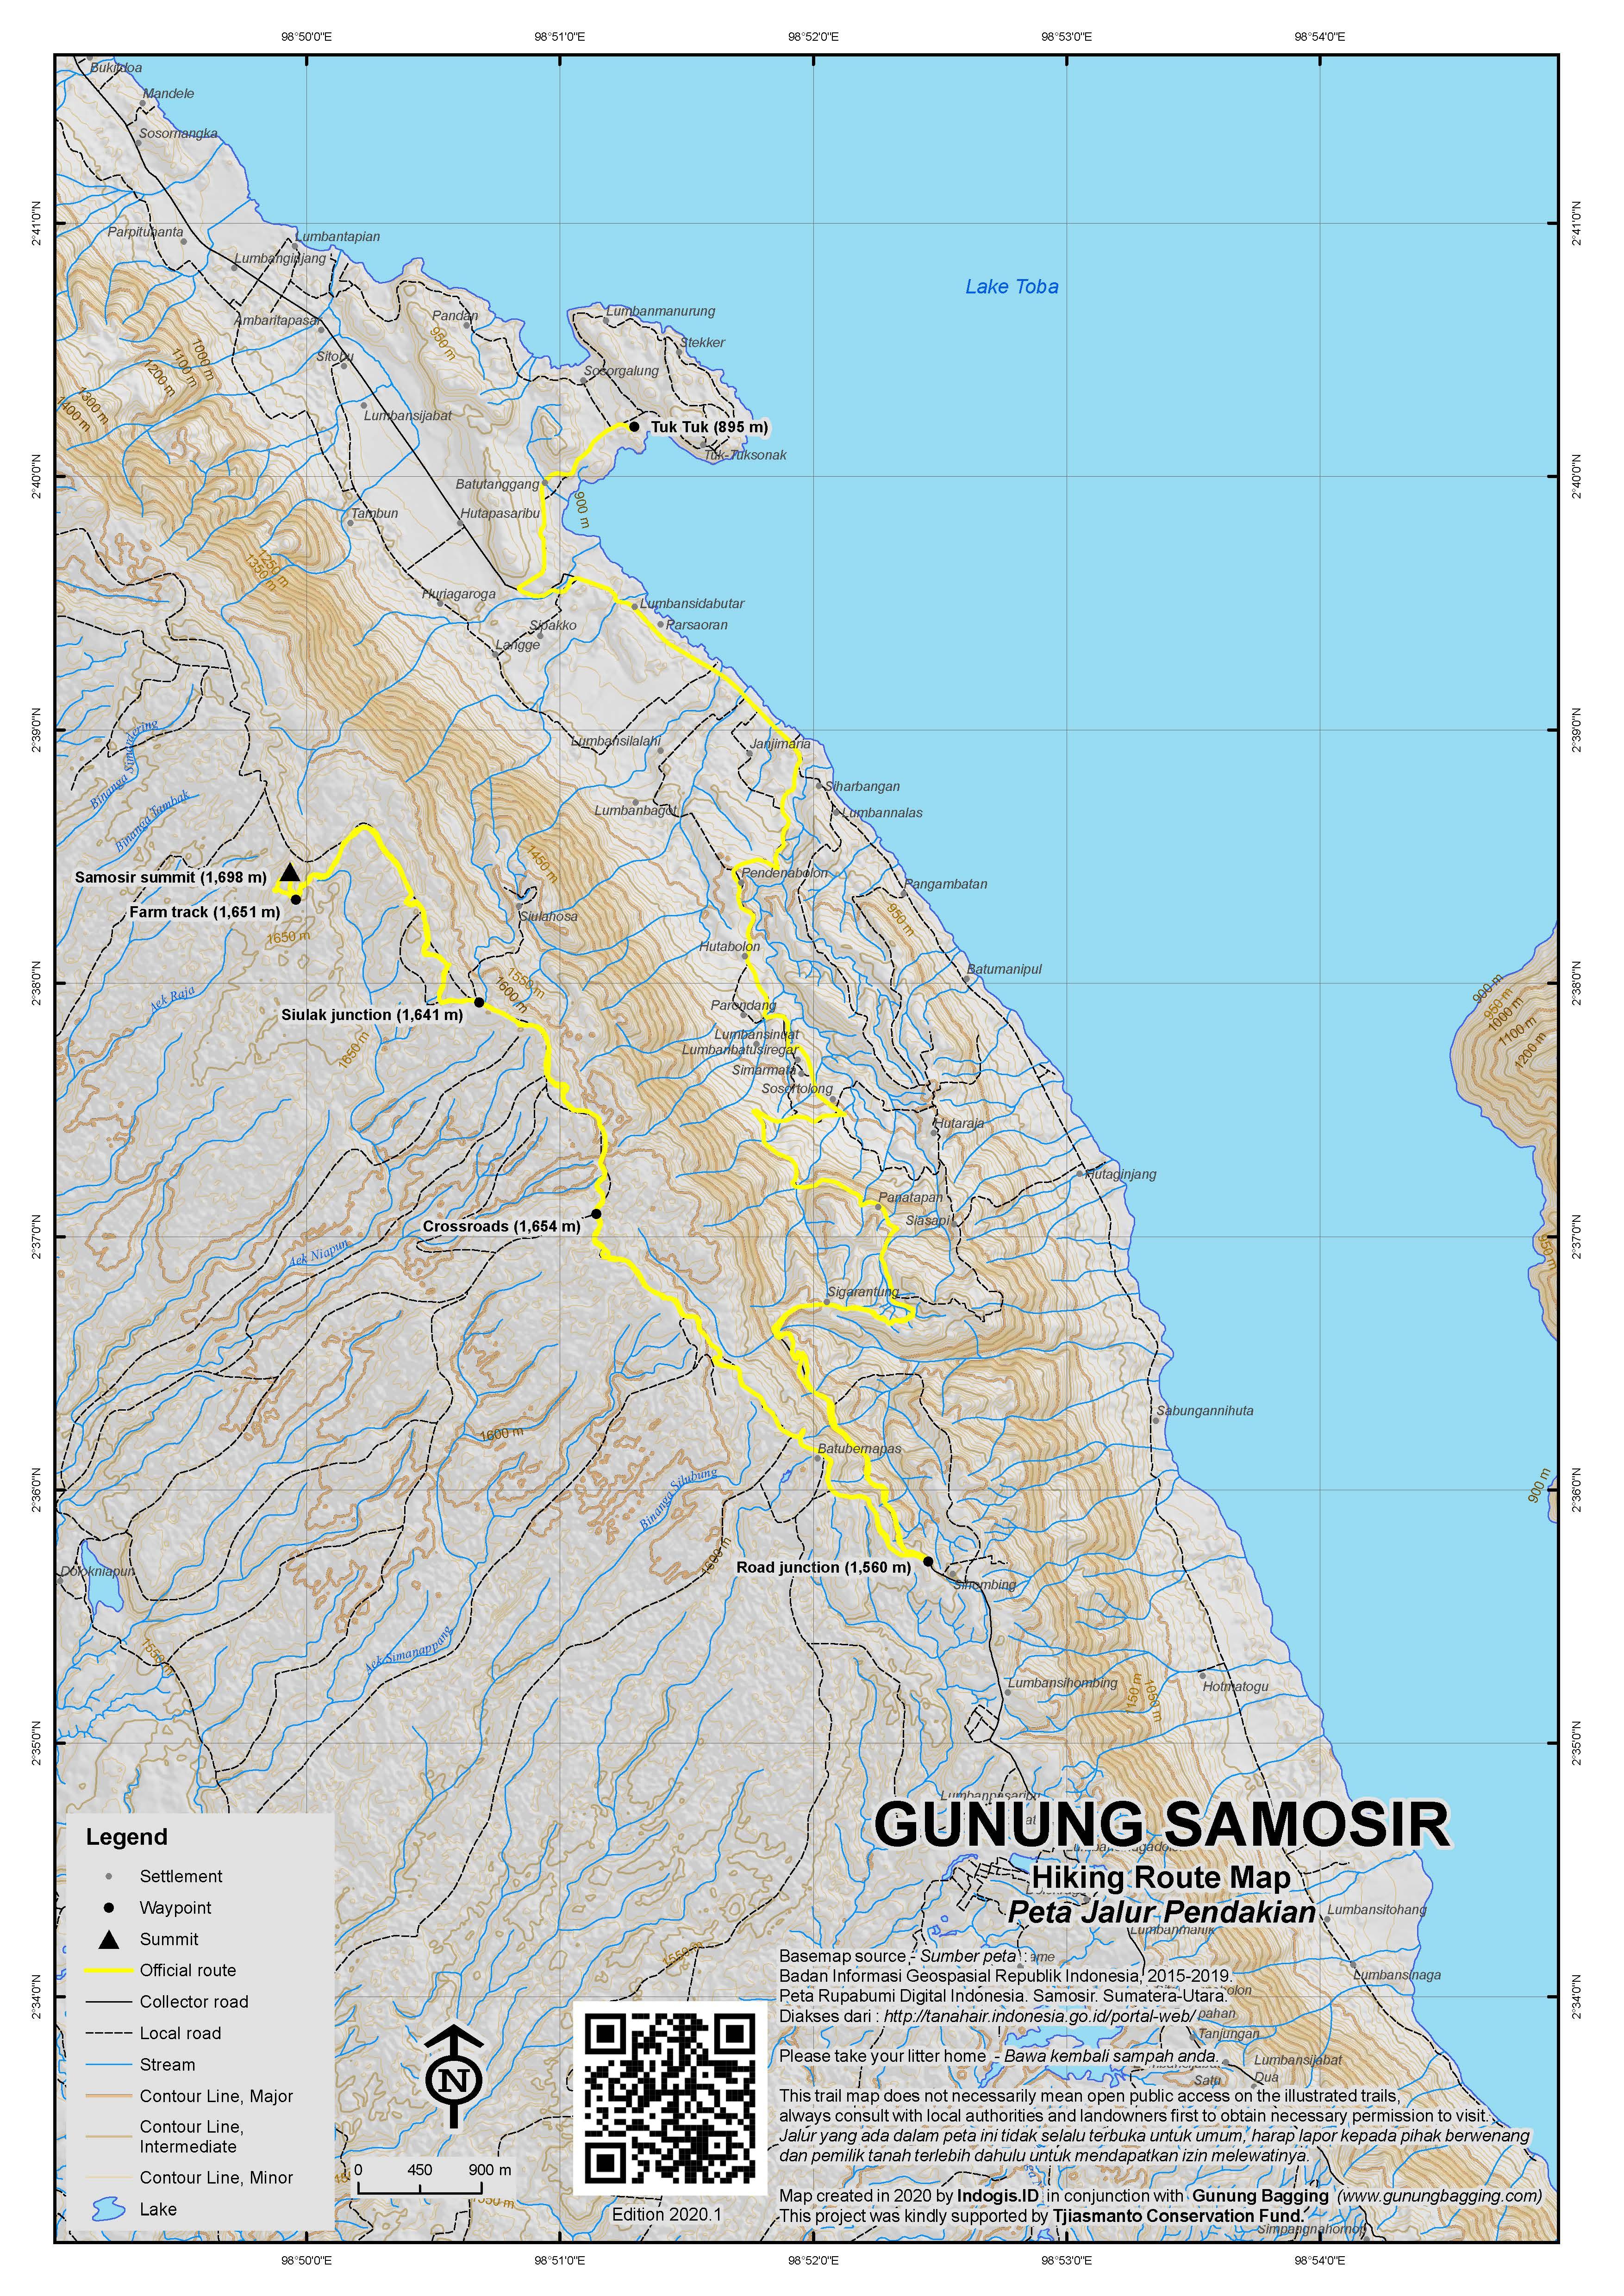 Peta Jalur Pendakian Gunung Samosir